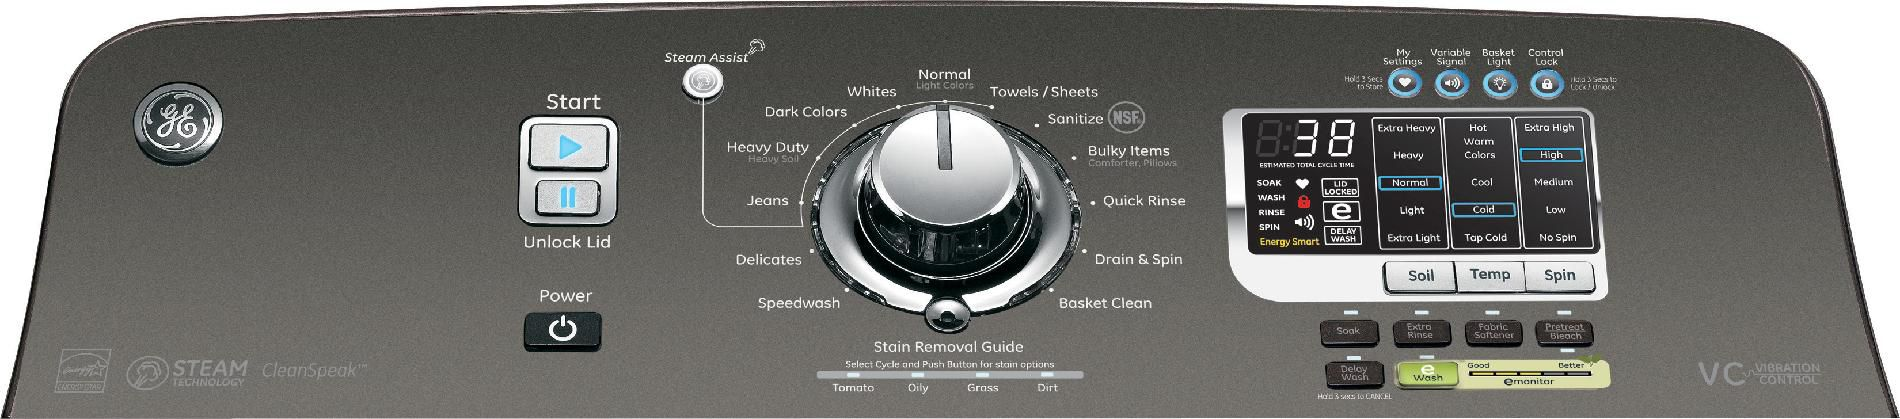 GE 4.8 cu. ft. Steam Top-Load Washer w/ Stainless Steel Basket - Metallic